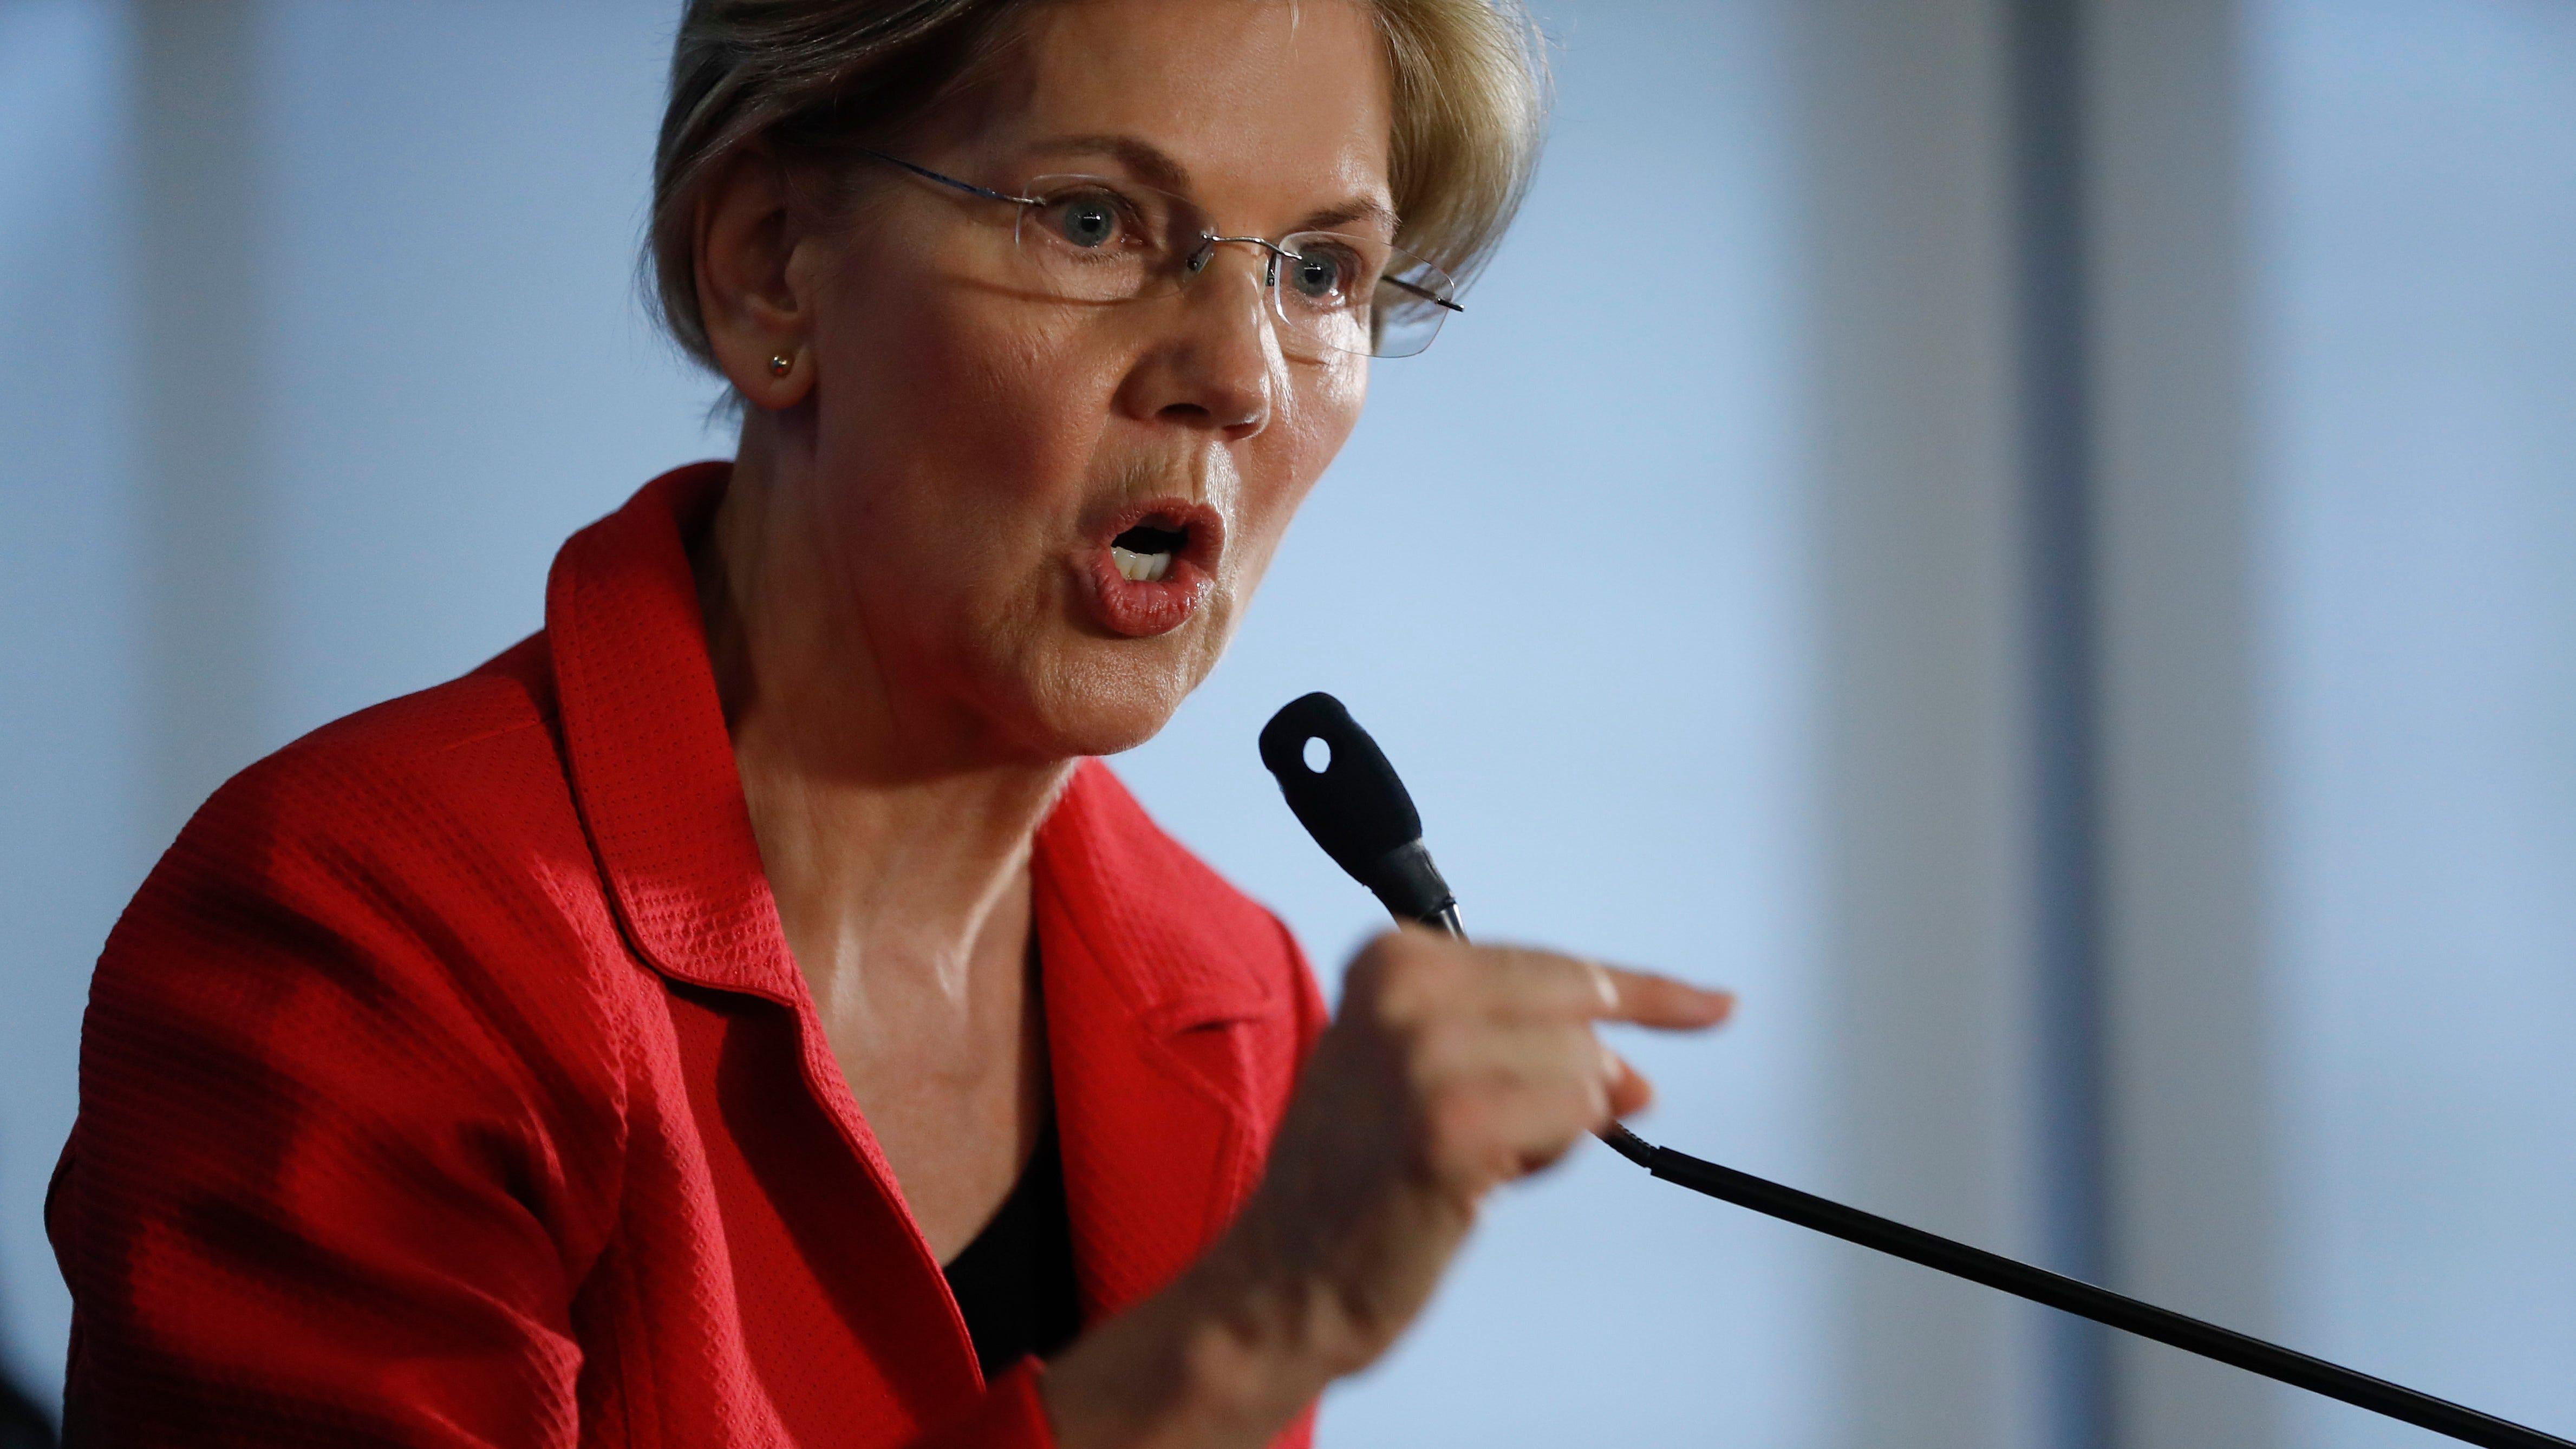 Sen. Elizabeth Warren, D-Mass., gestures while speaking at the National Press Club in Washington, on Aug. 21, 2018.